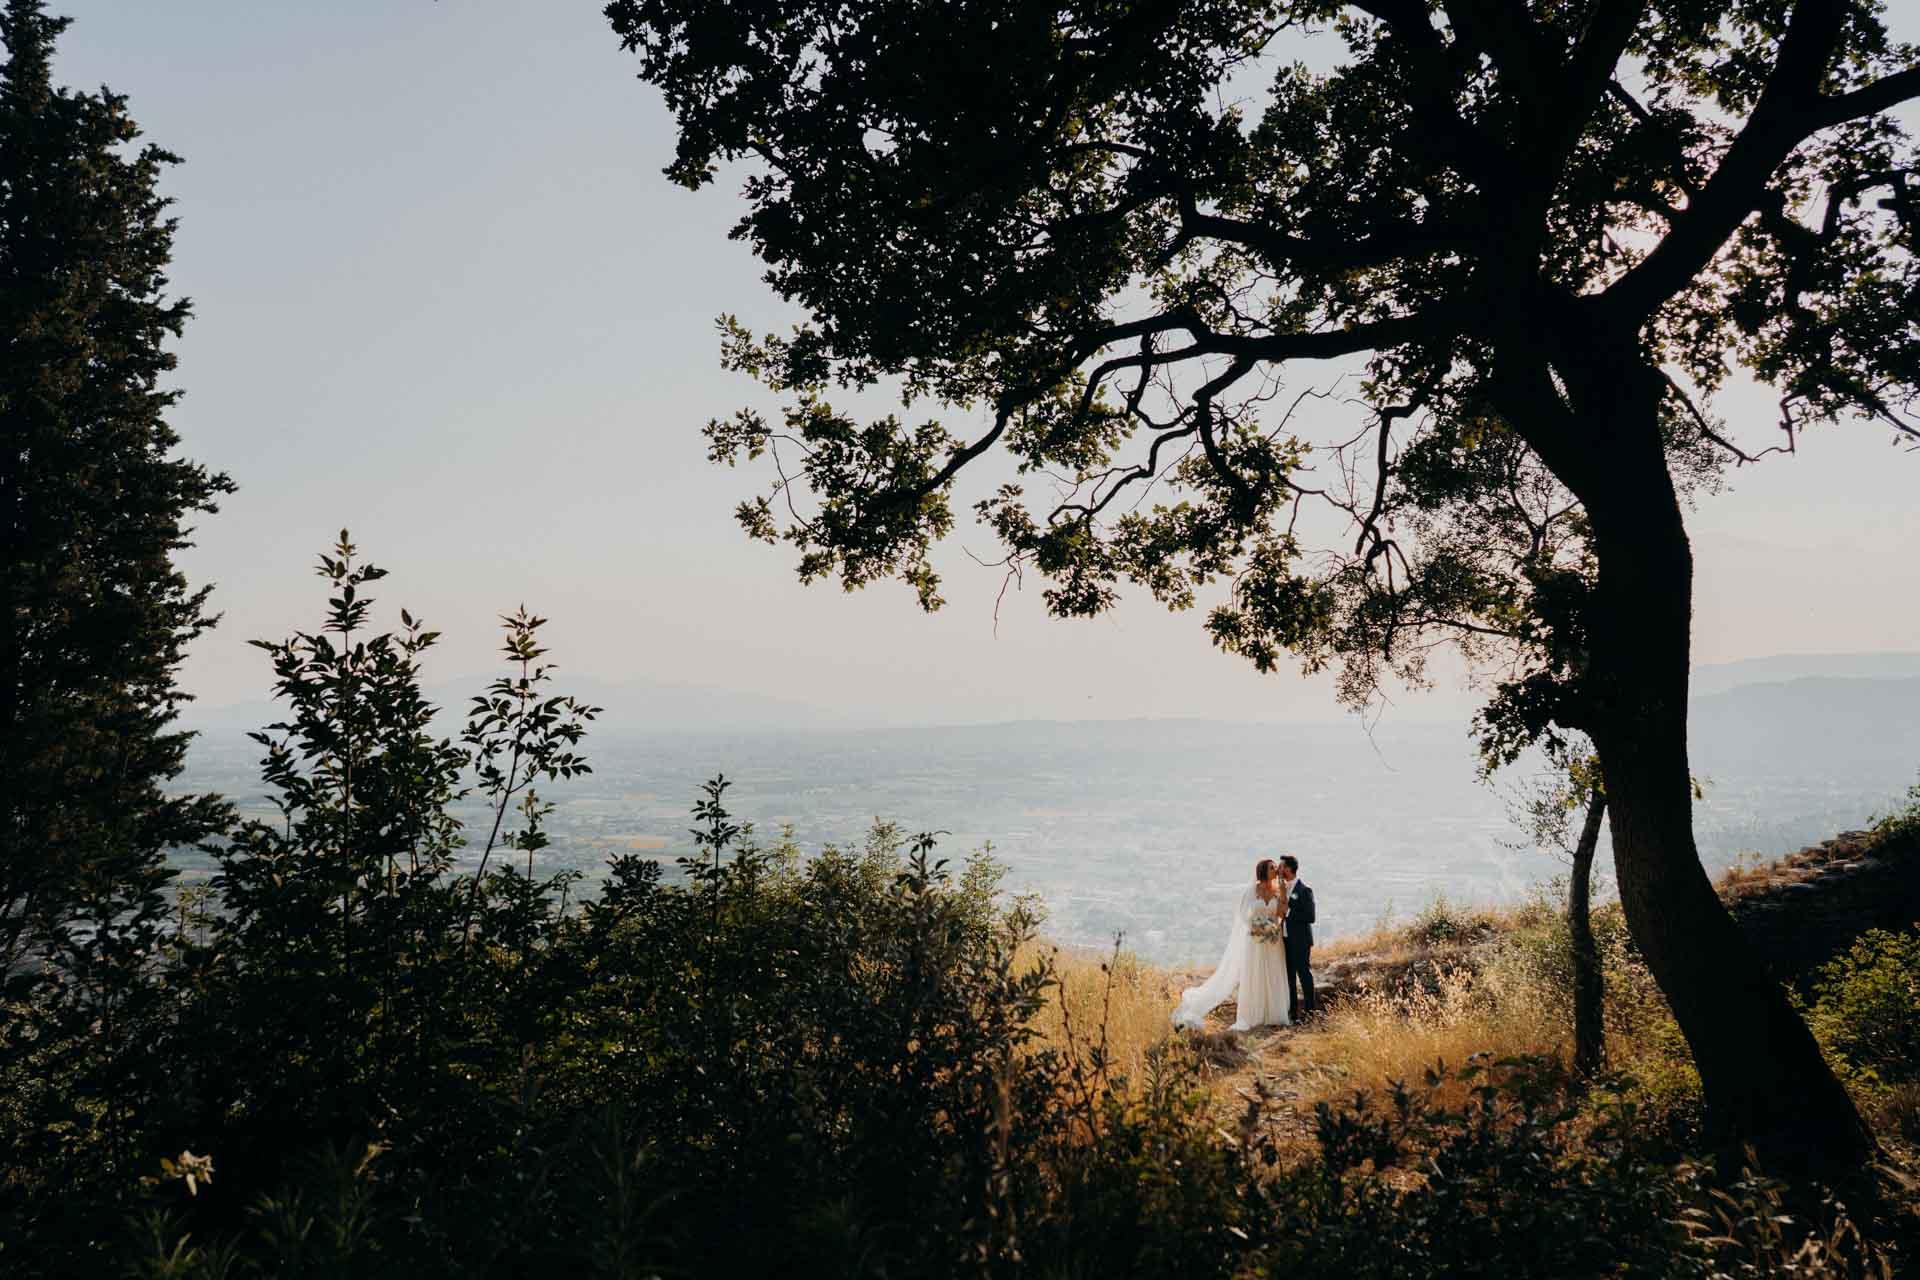 fotografo_matrimonio_toscana_poggio_tondo_85